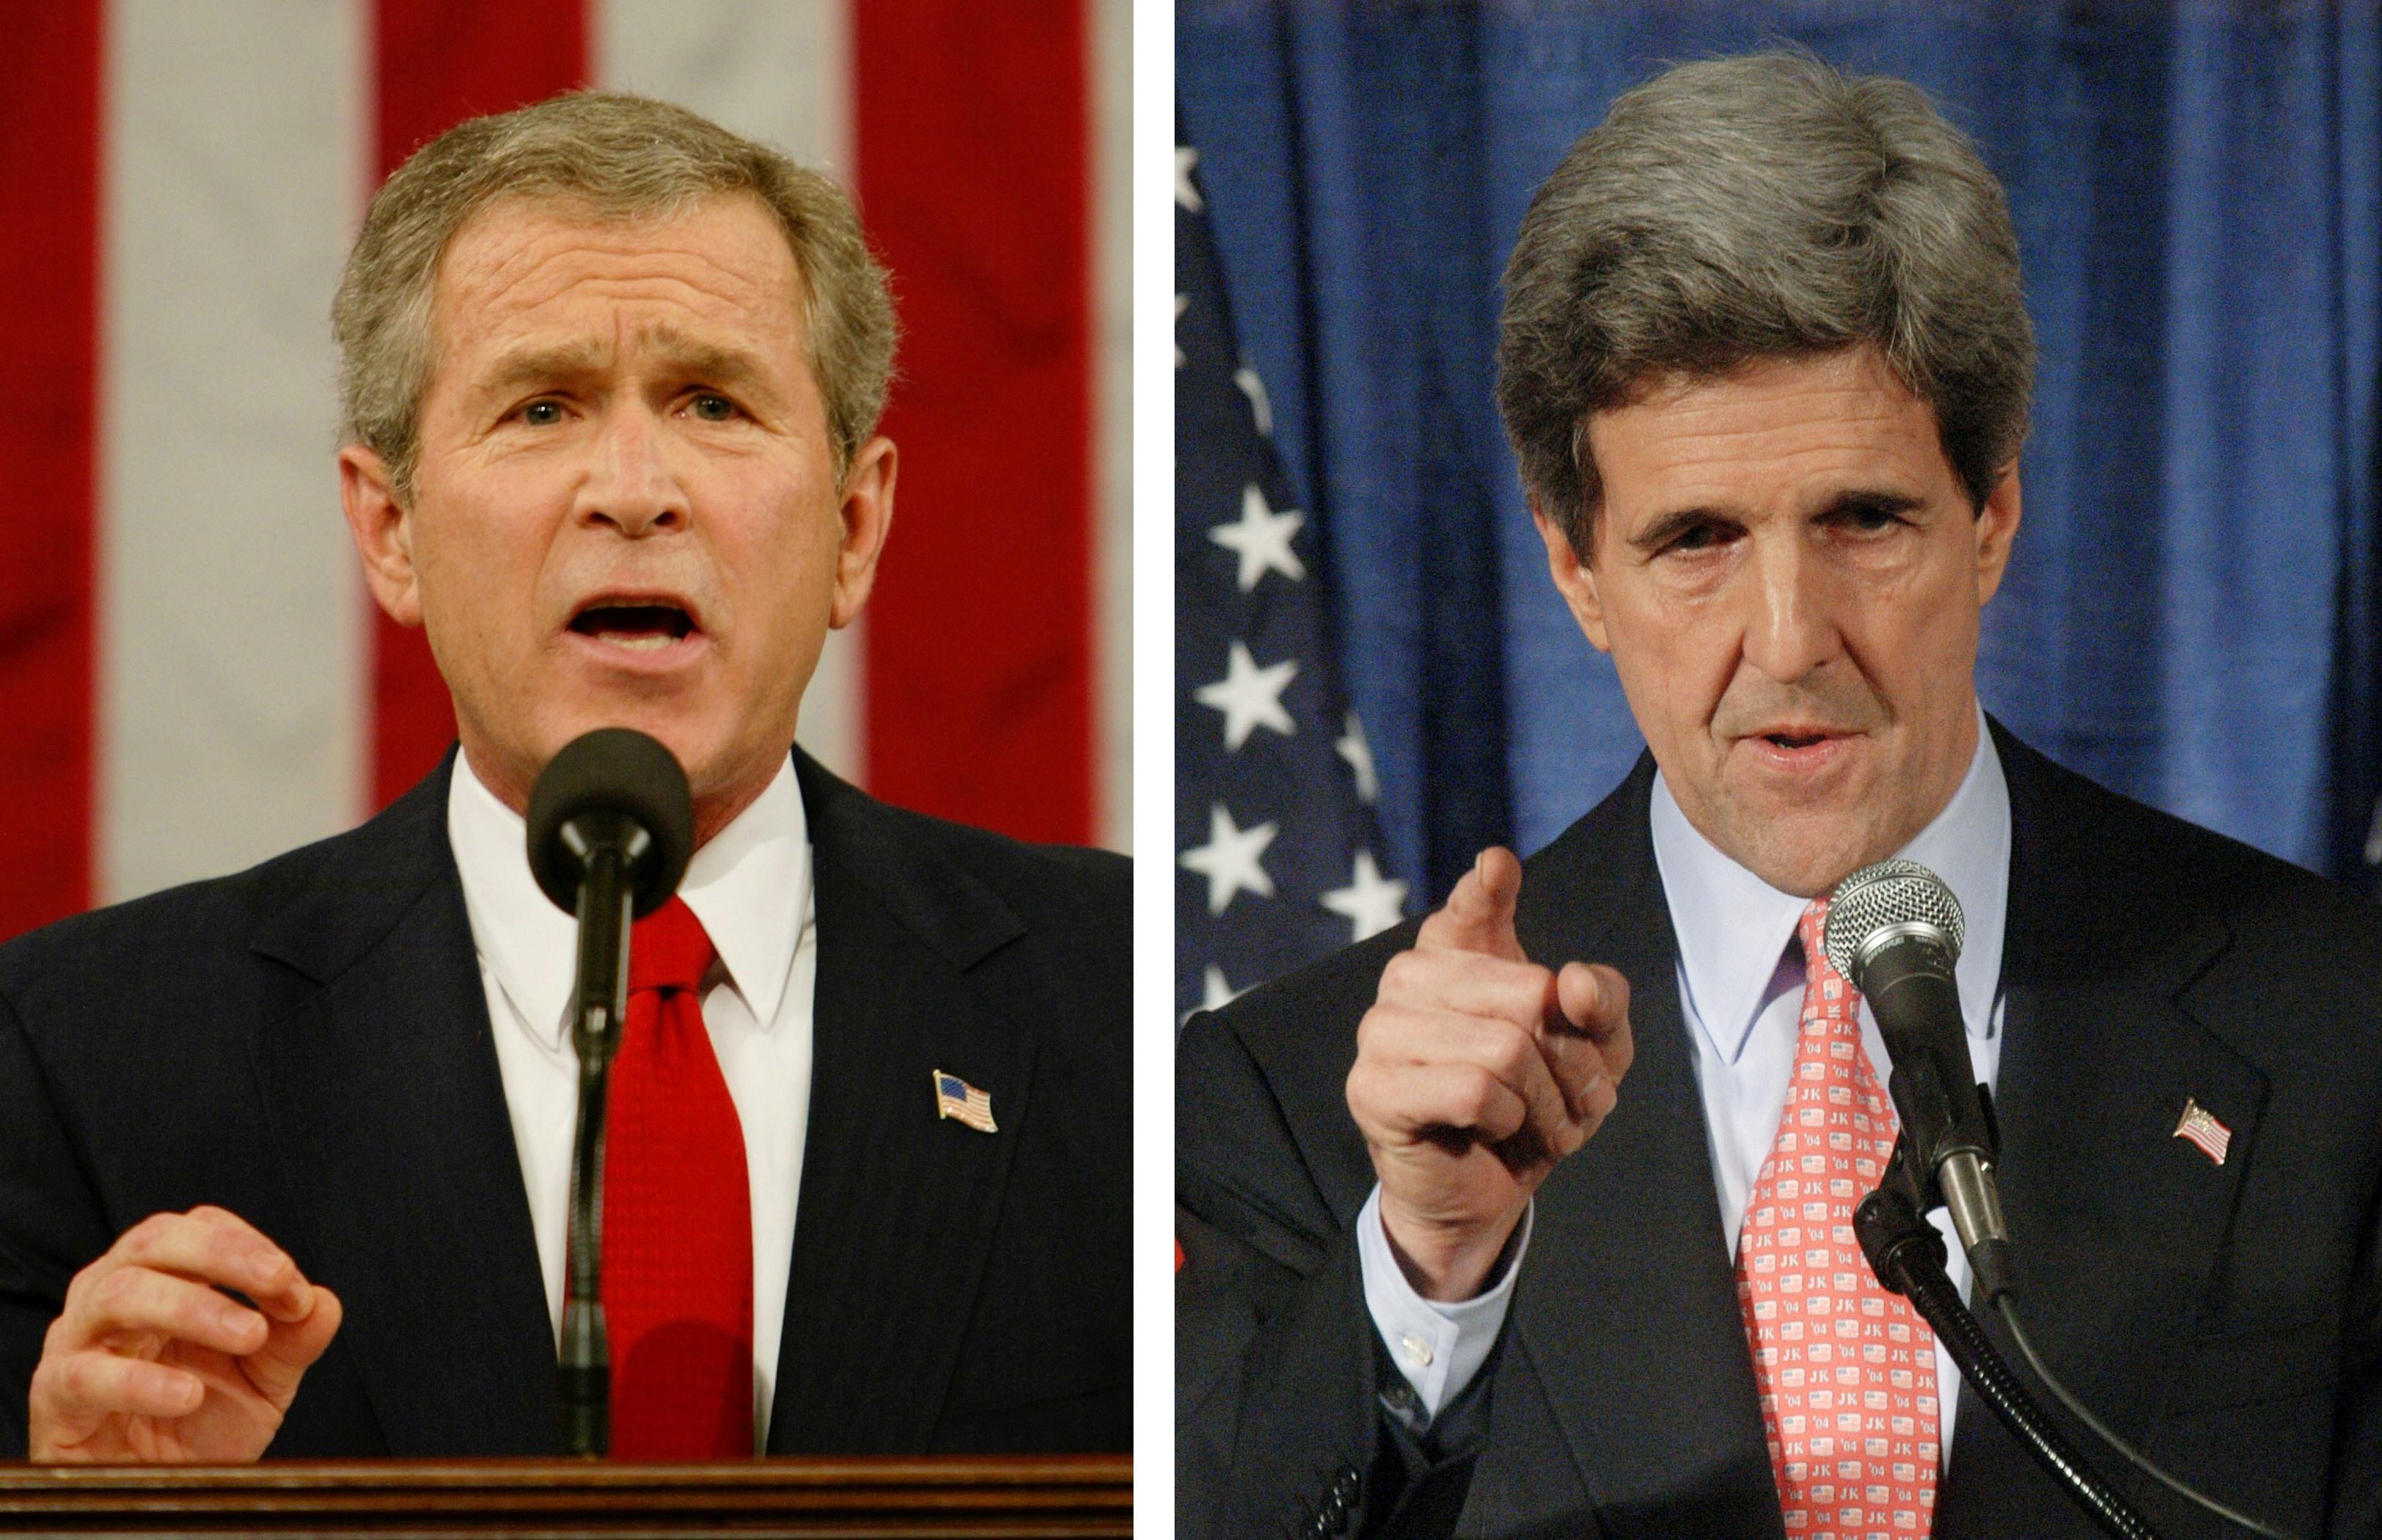 George W Bush v John Kerry